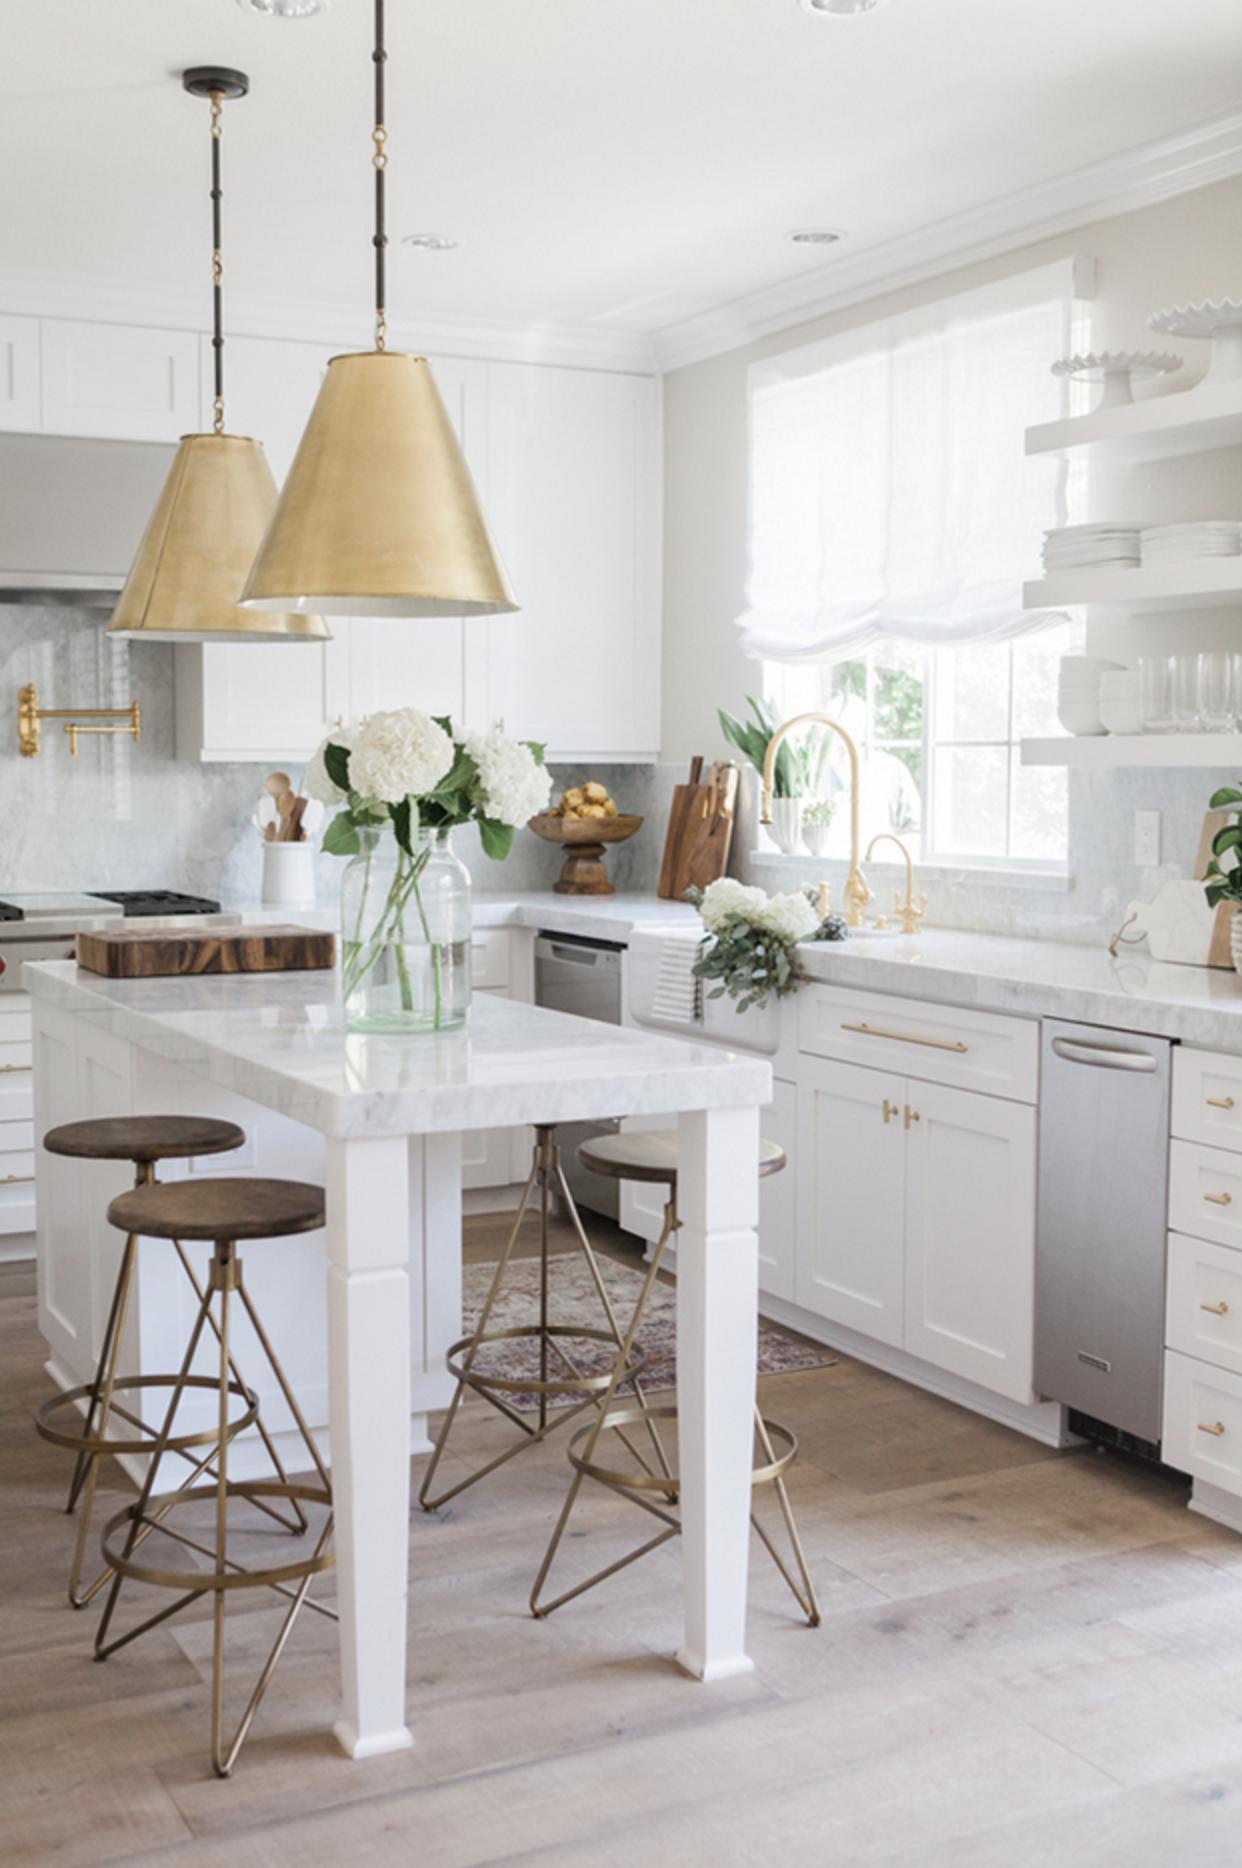 Arteriors Home Wyndham Natural Wax Counter Stool | Pinterest